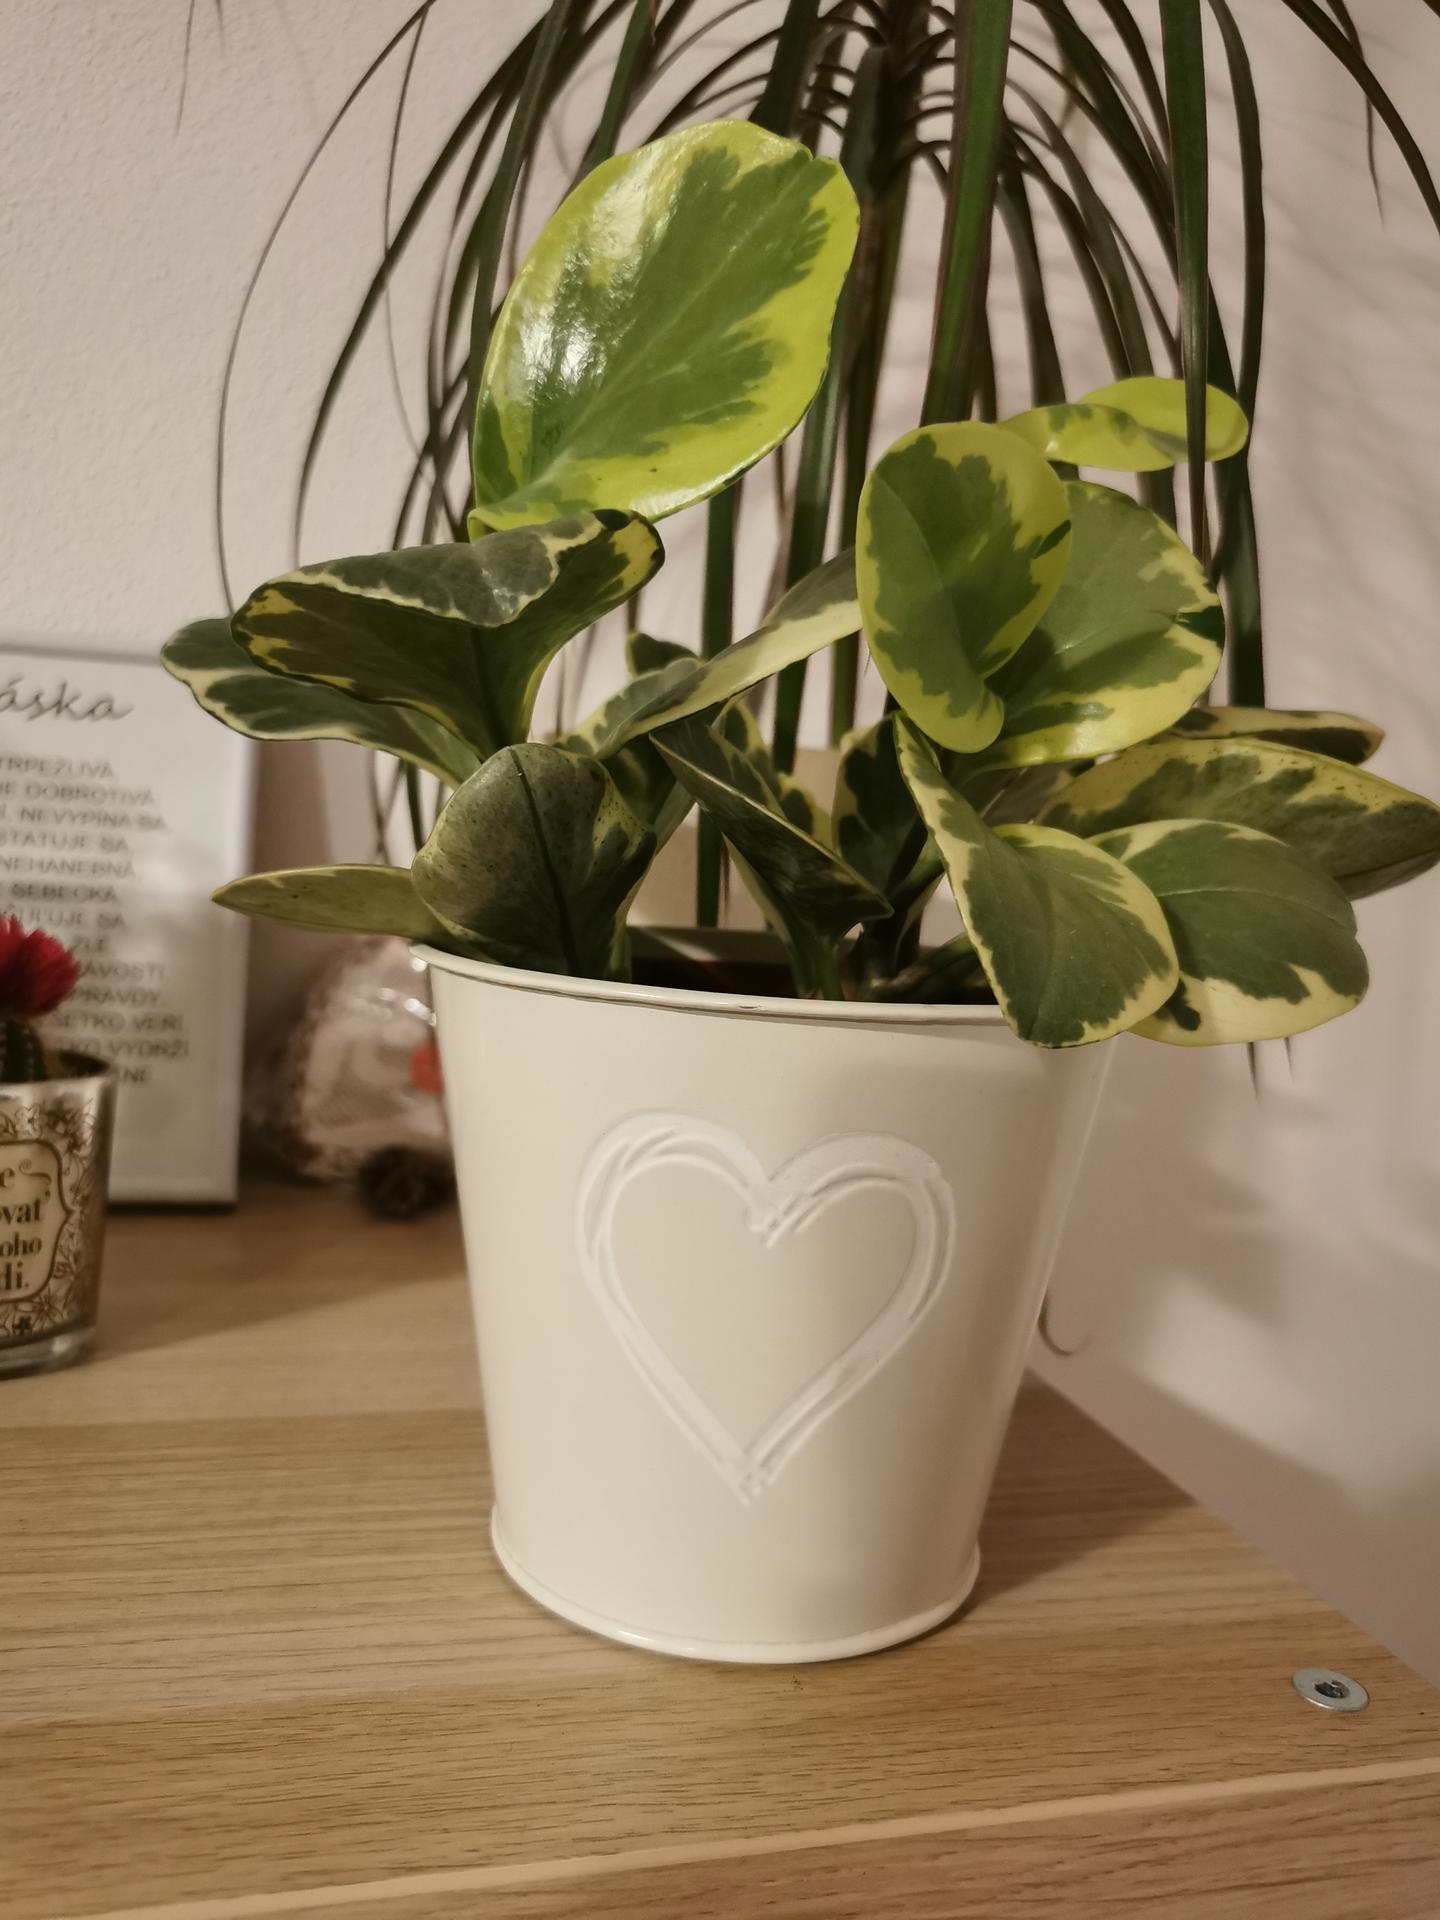 Moje krásne kvetinky - peperomia obtusifolia variegata (1/2021)